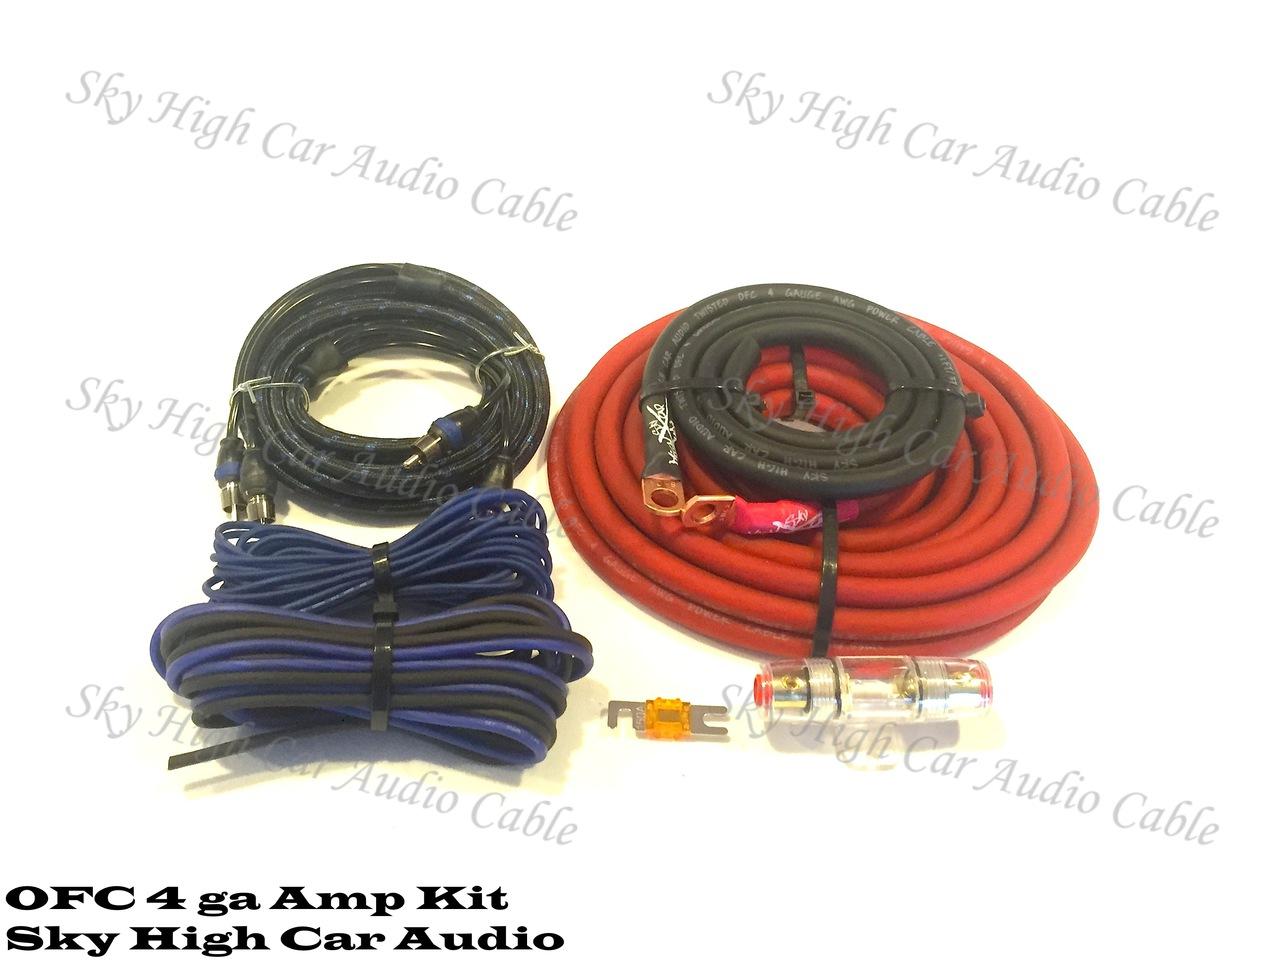 Sky High Car Audio 4 Ofc Amp Kit Ampkit4 Gauge Contaq Amplifier Wiring Lanzar Installation Parts